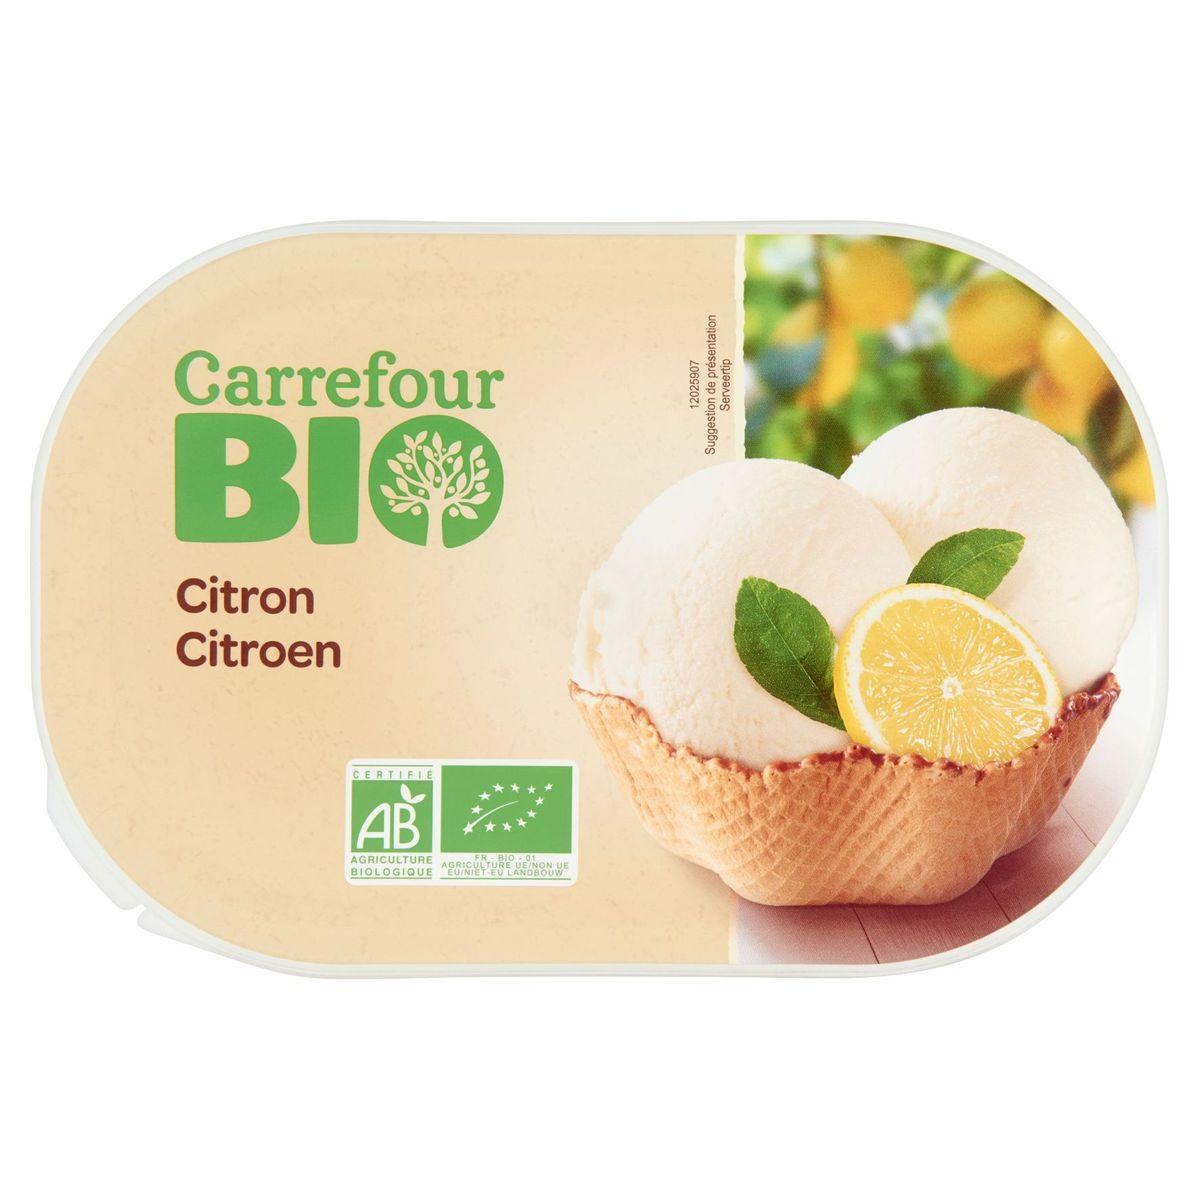 Carrefour Bio Citron 495 g